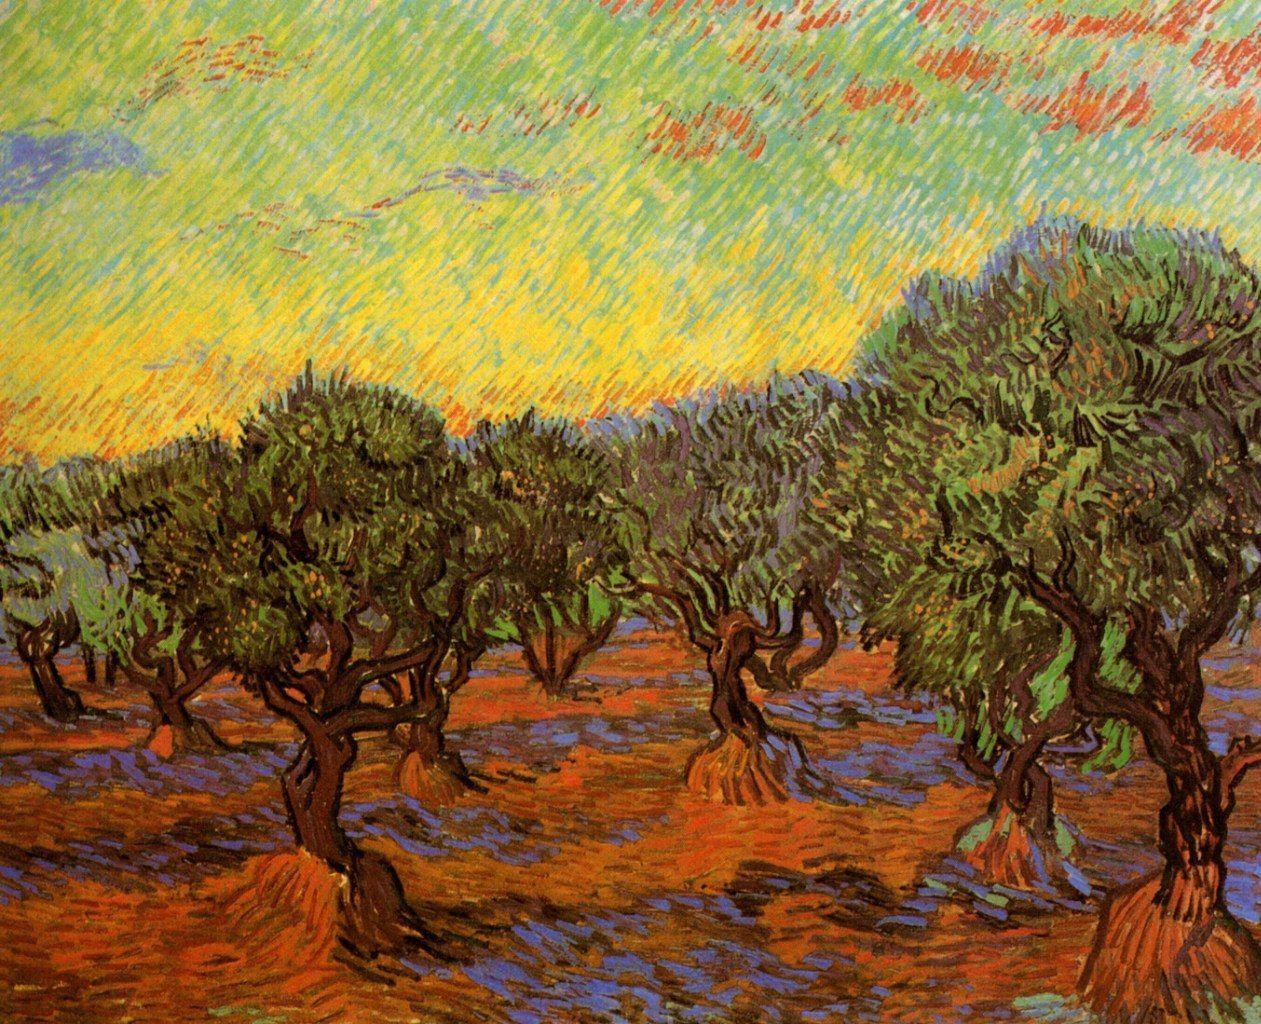 Vincent van Gogh Винсент ван гог, Искусство ван гога